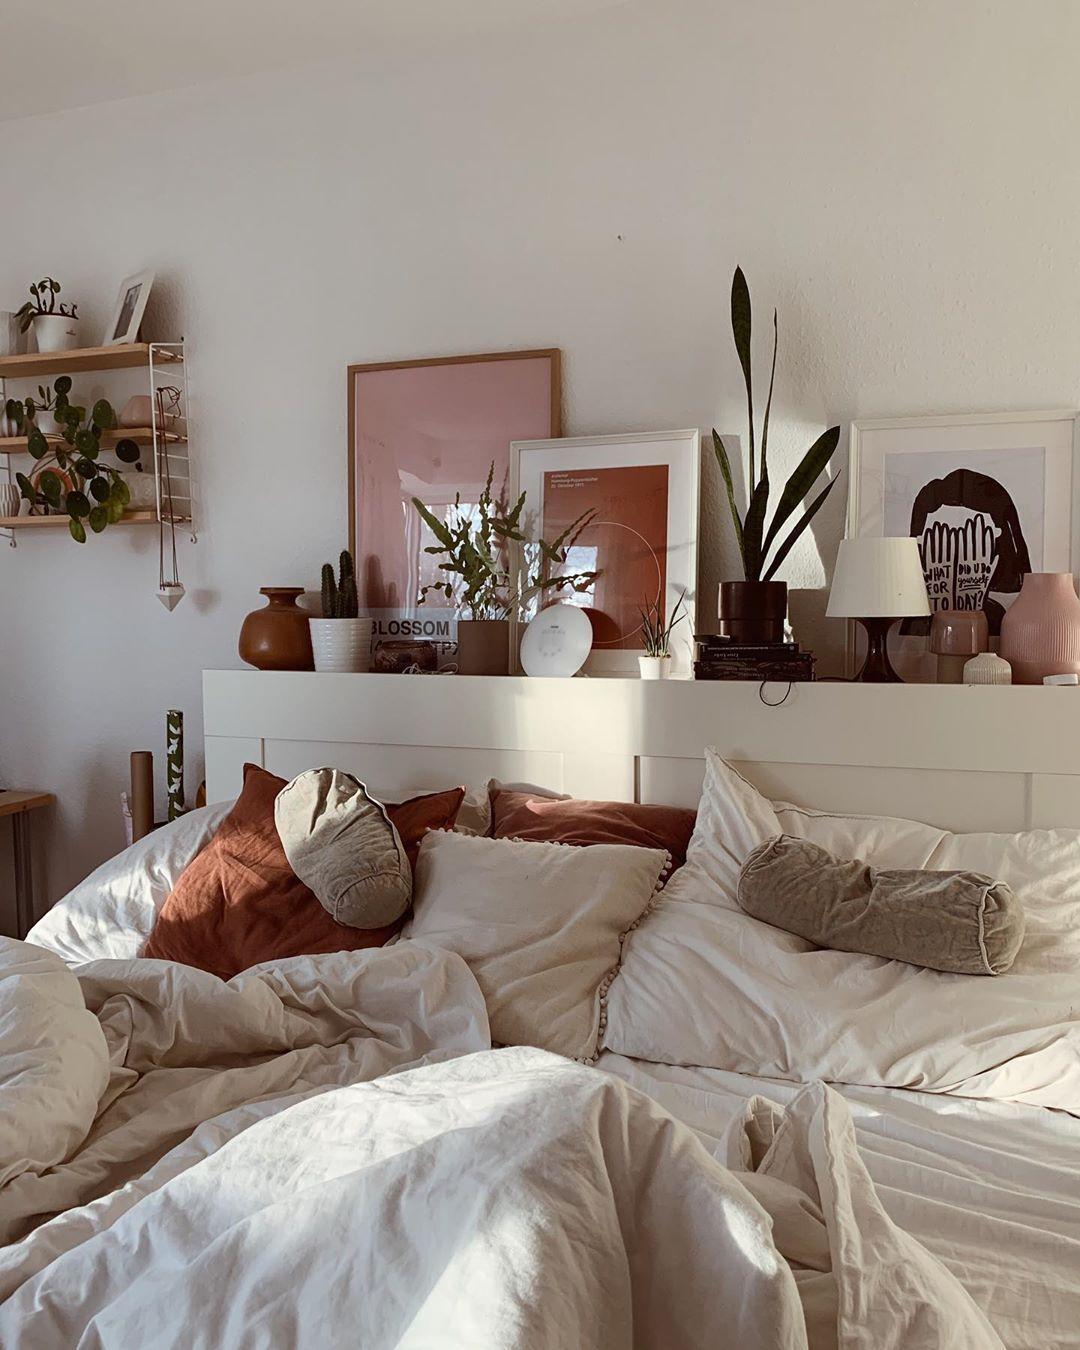 Photo of reorganizing bedroom ideas